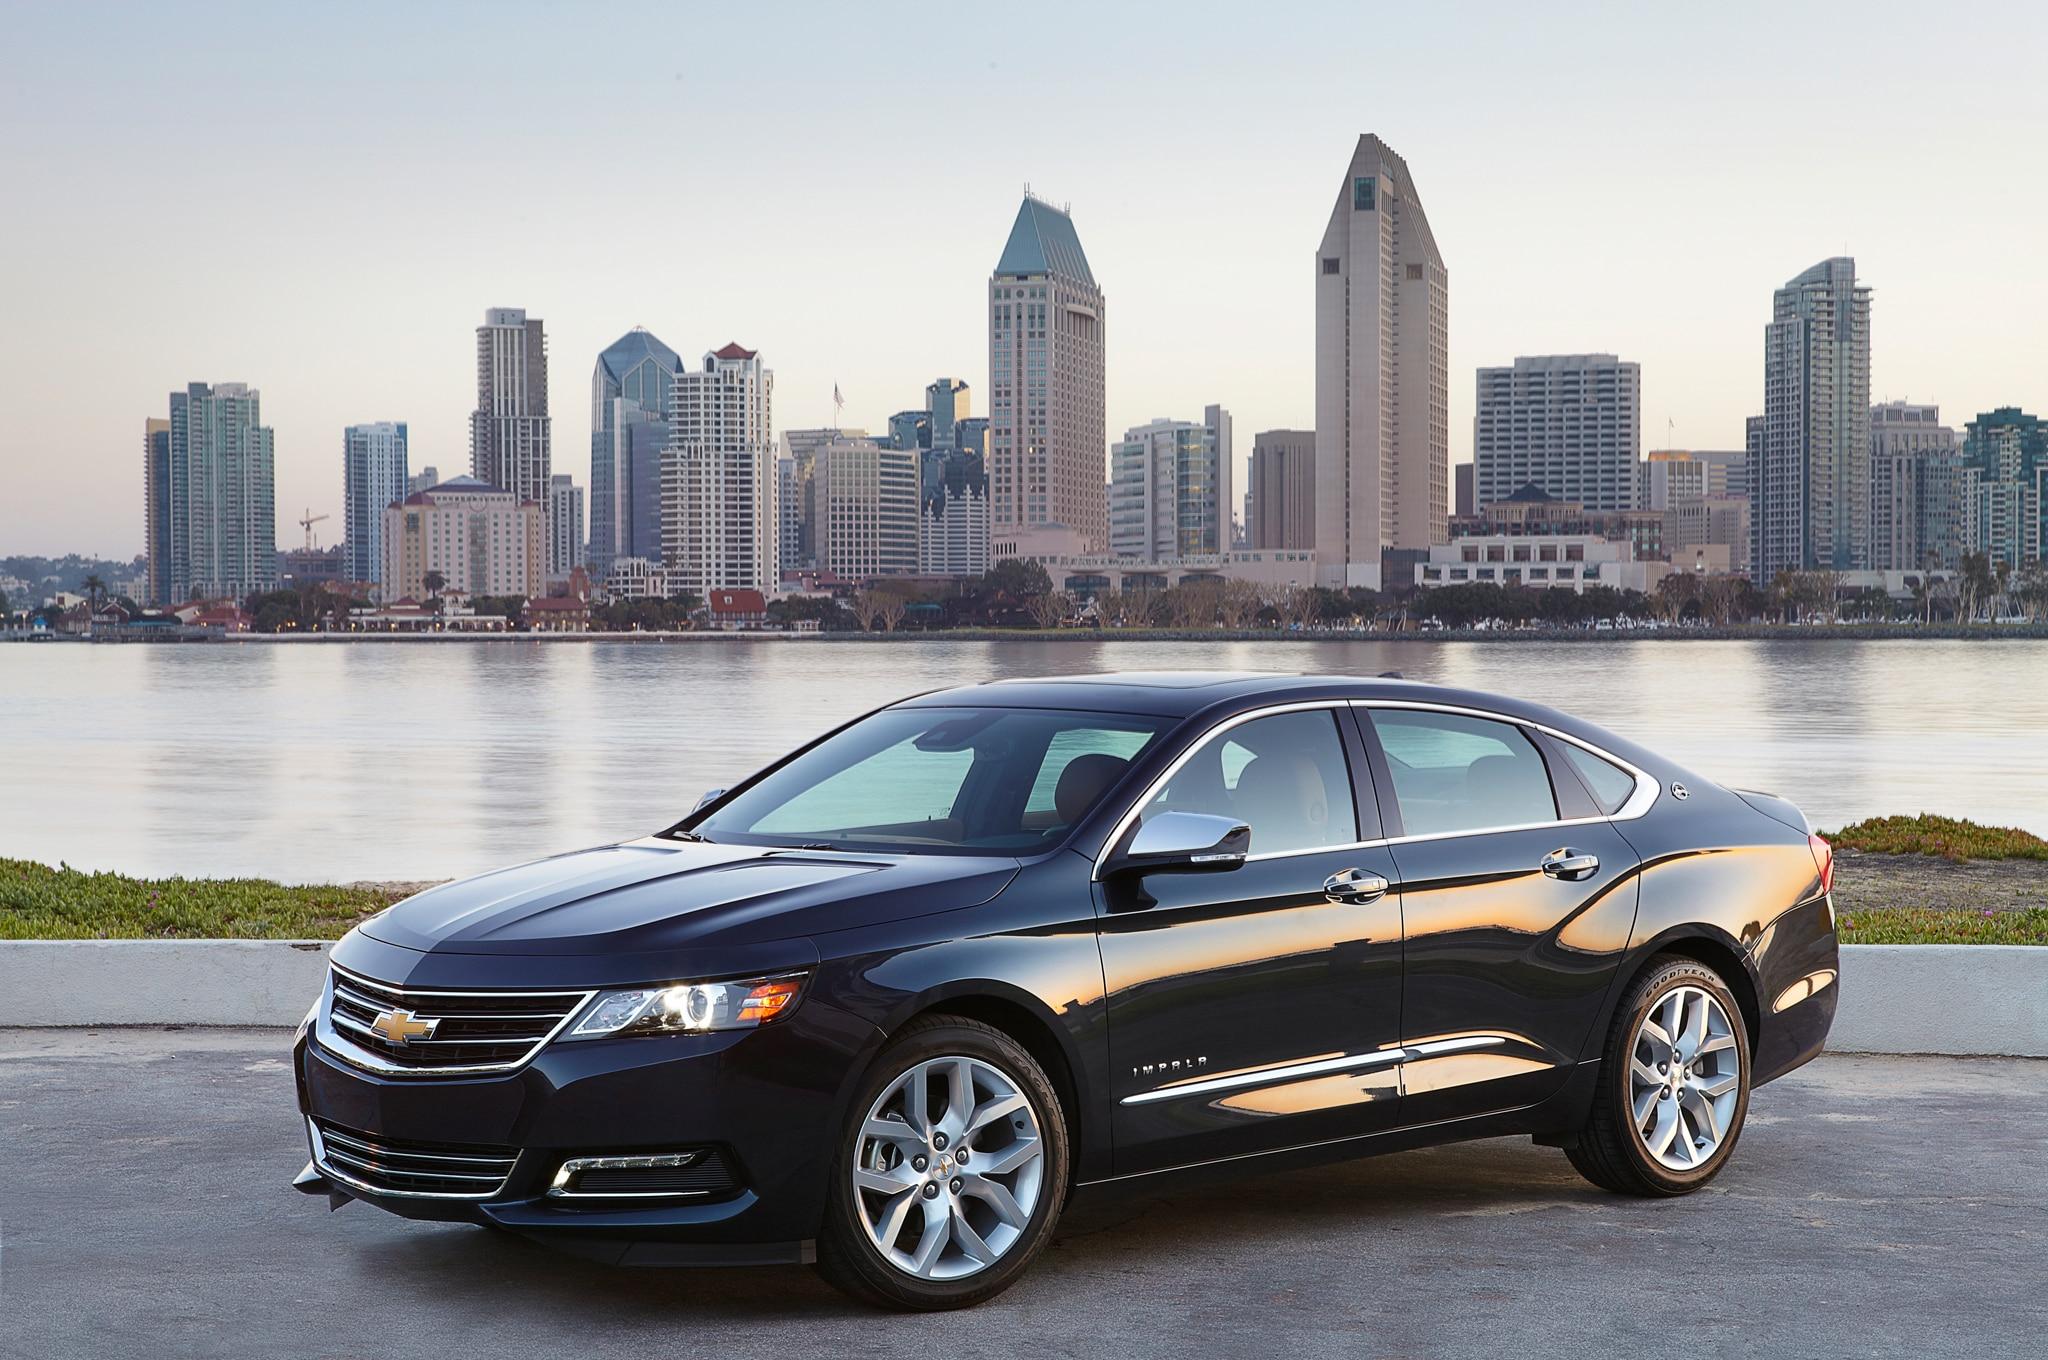 2015 Chevrolet Impala Bi-Fuel Review